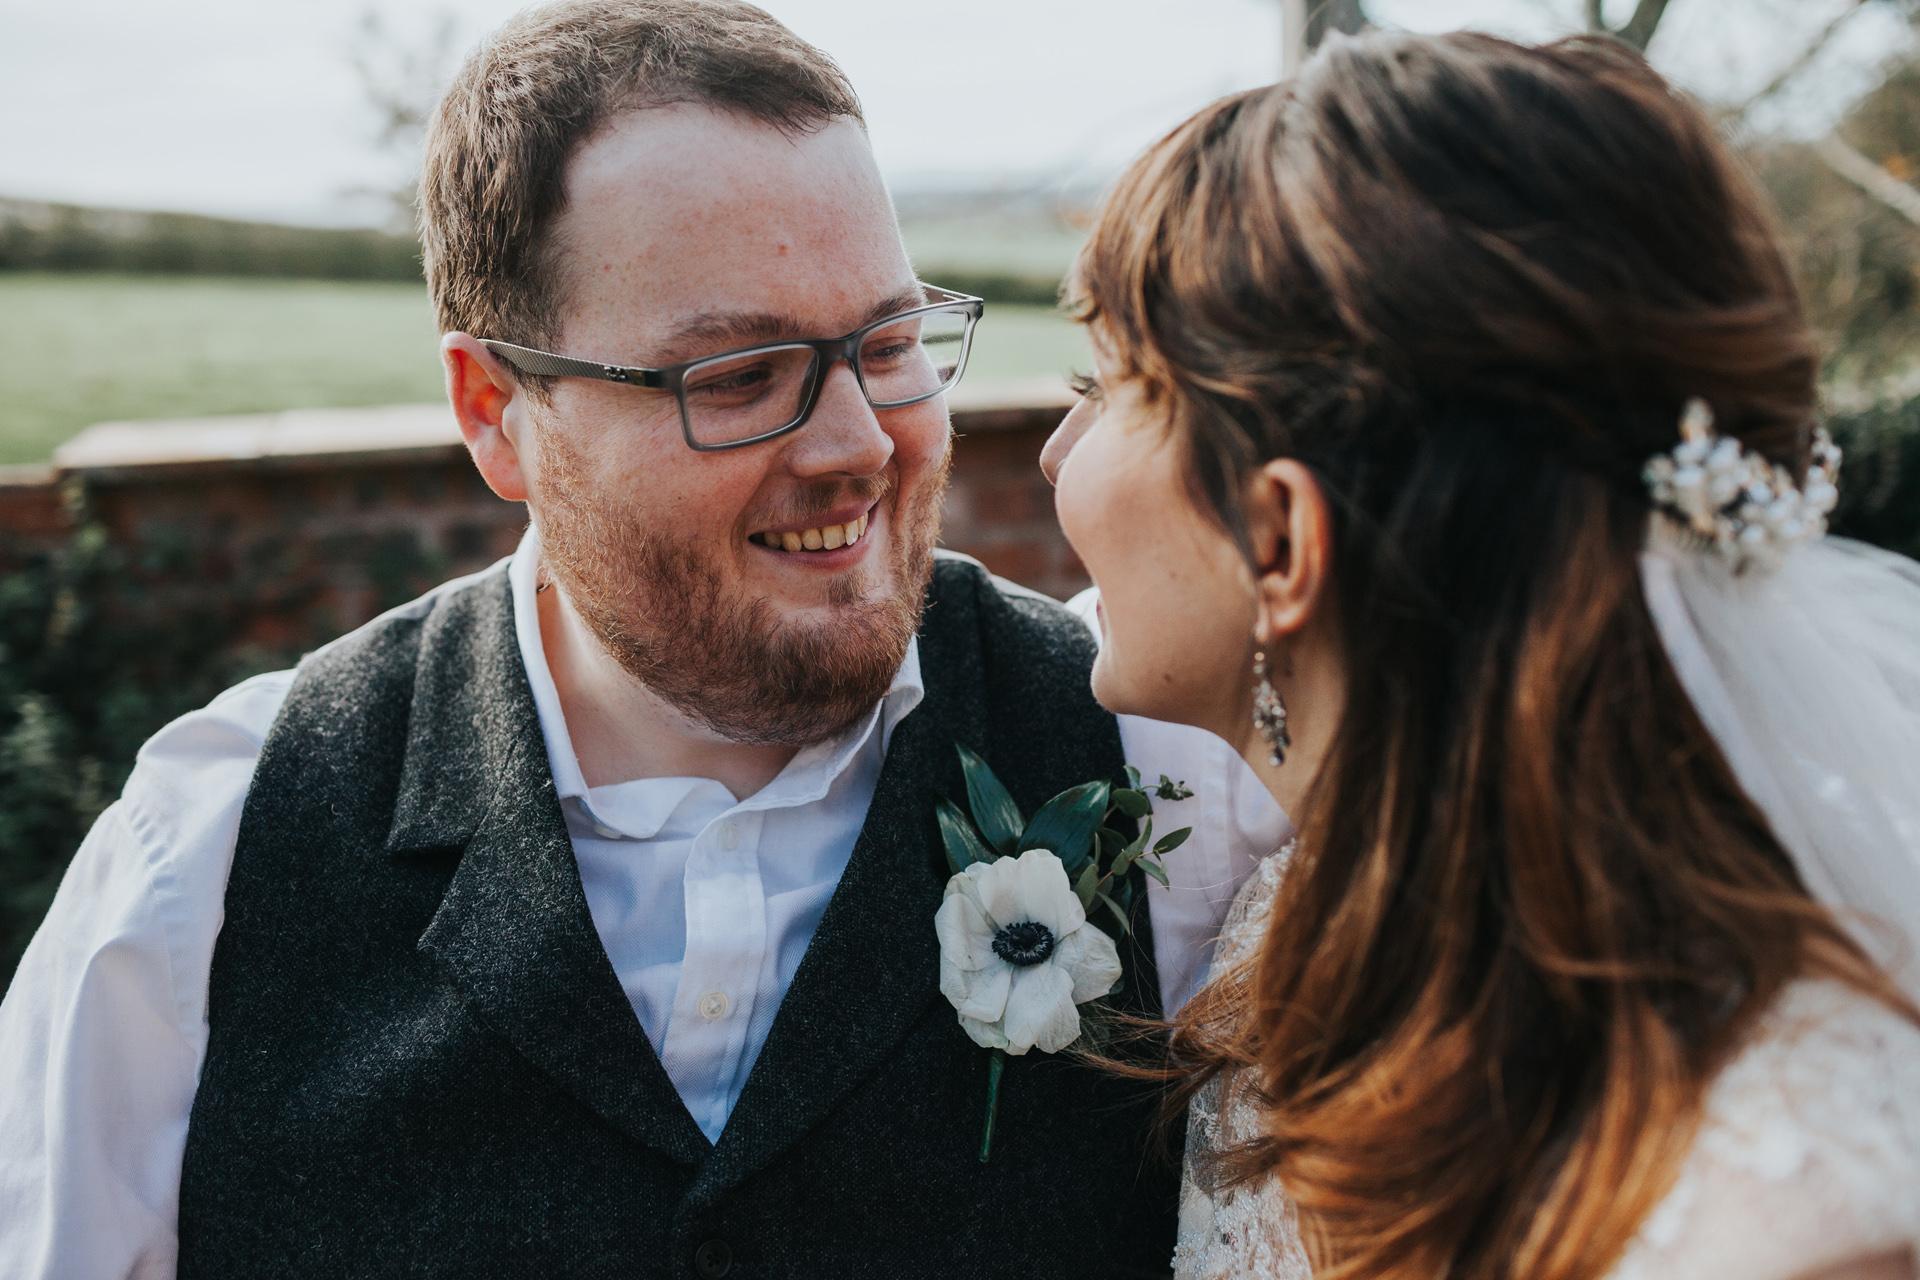 Groom smiling at bride.